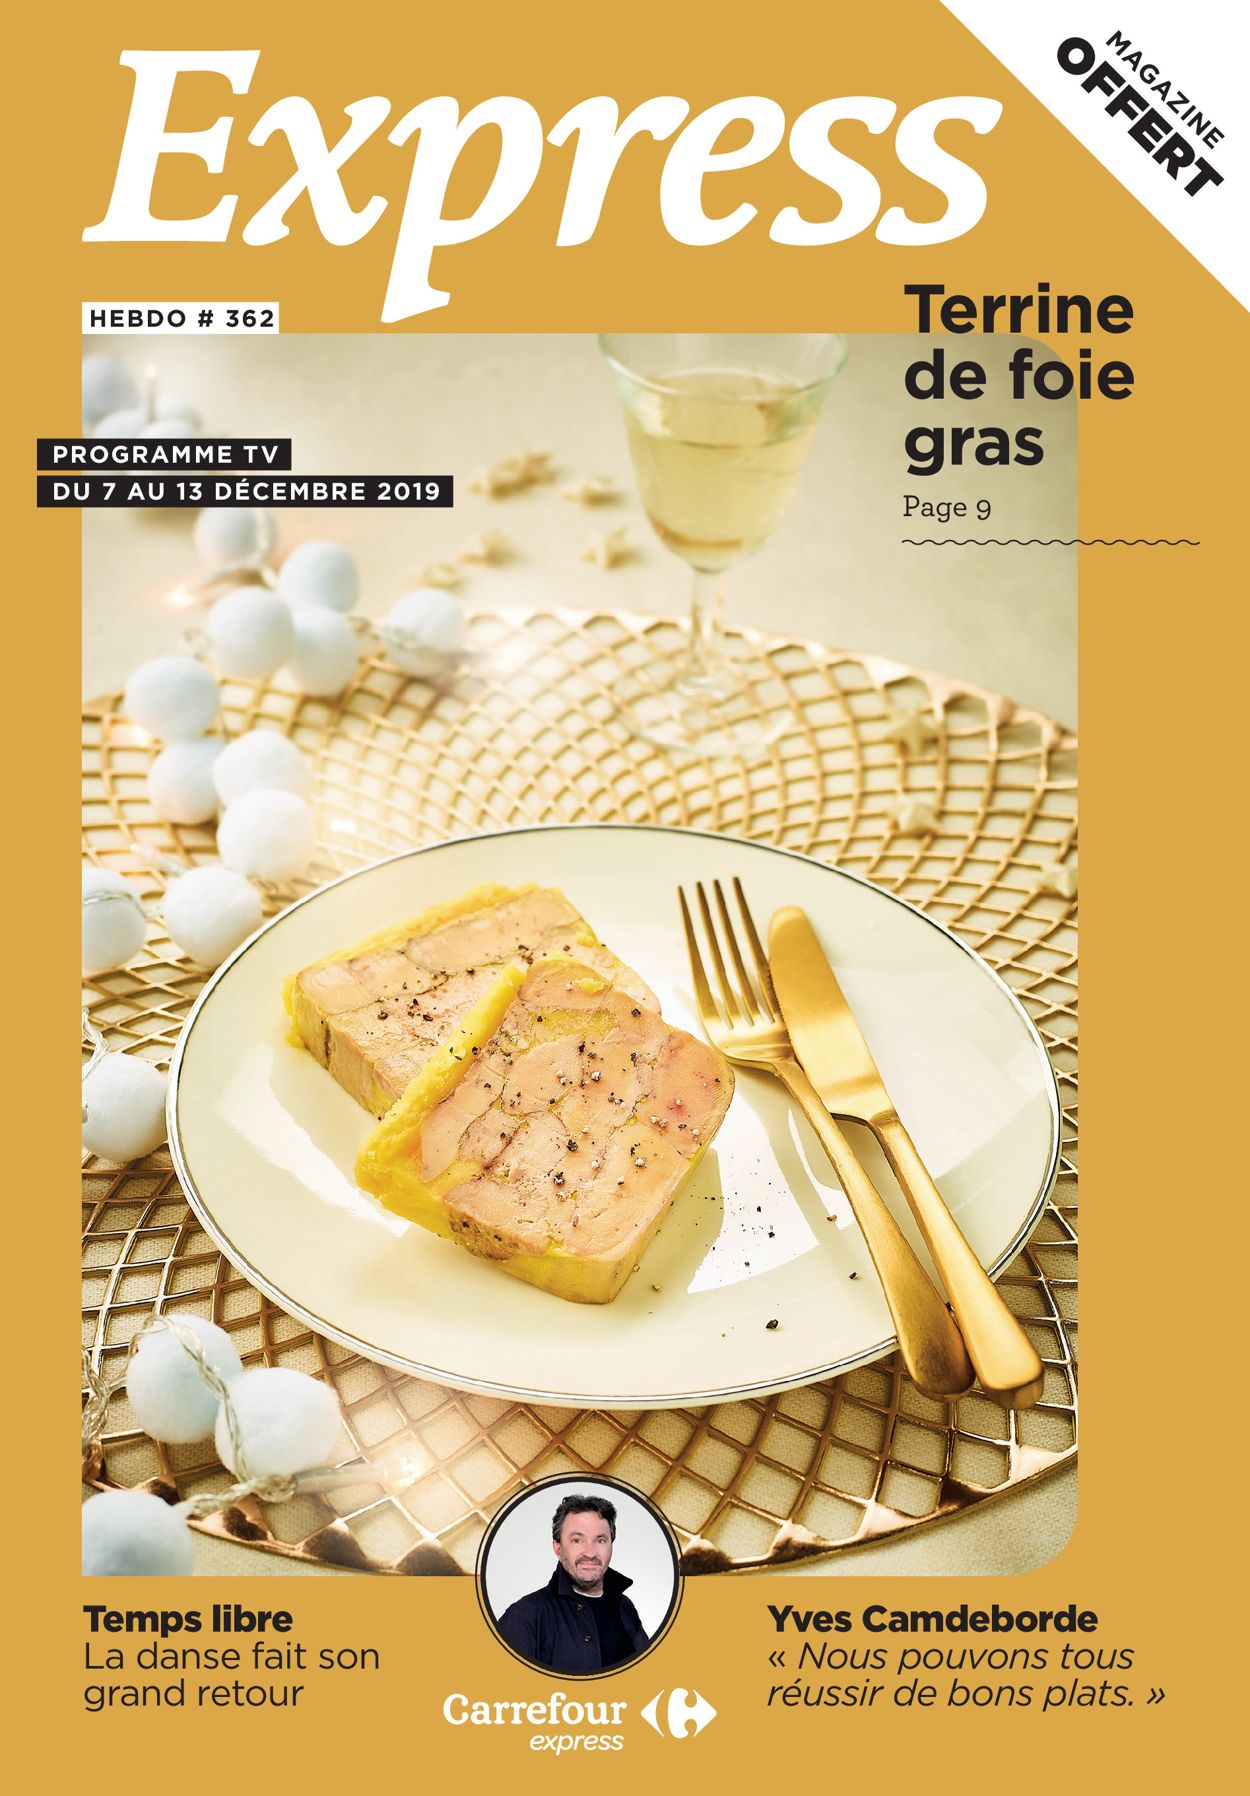 Carrefour catalogue de Noël 2019 Catalogue - 07.12-13.12.2019